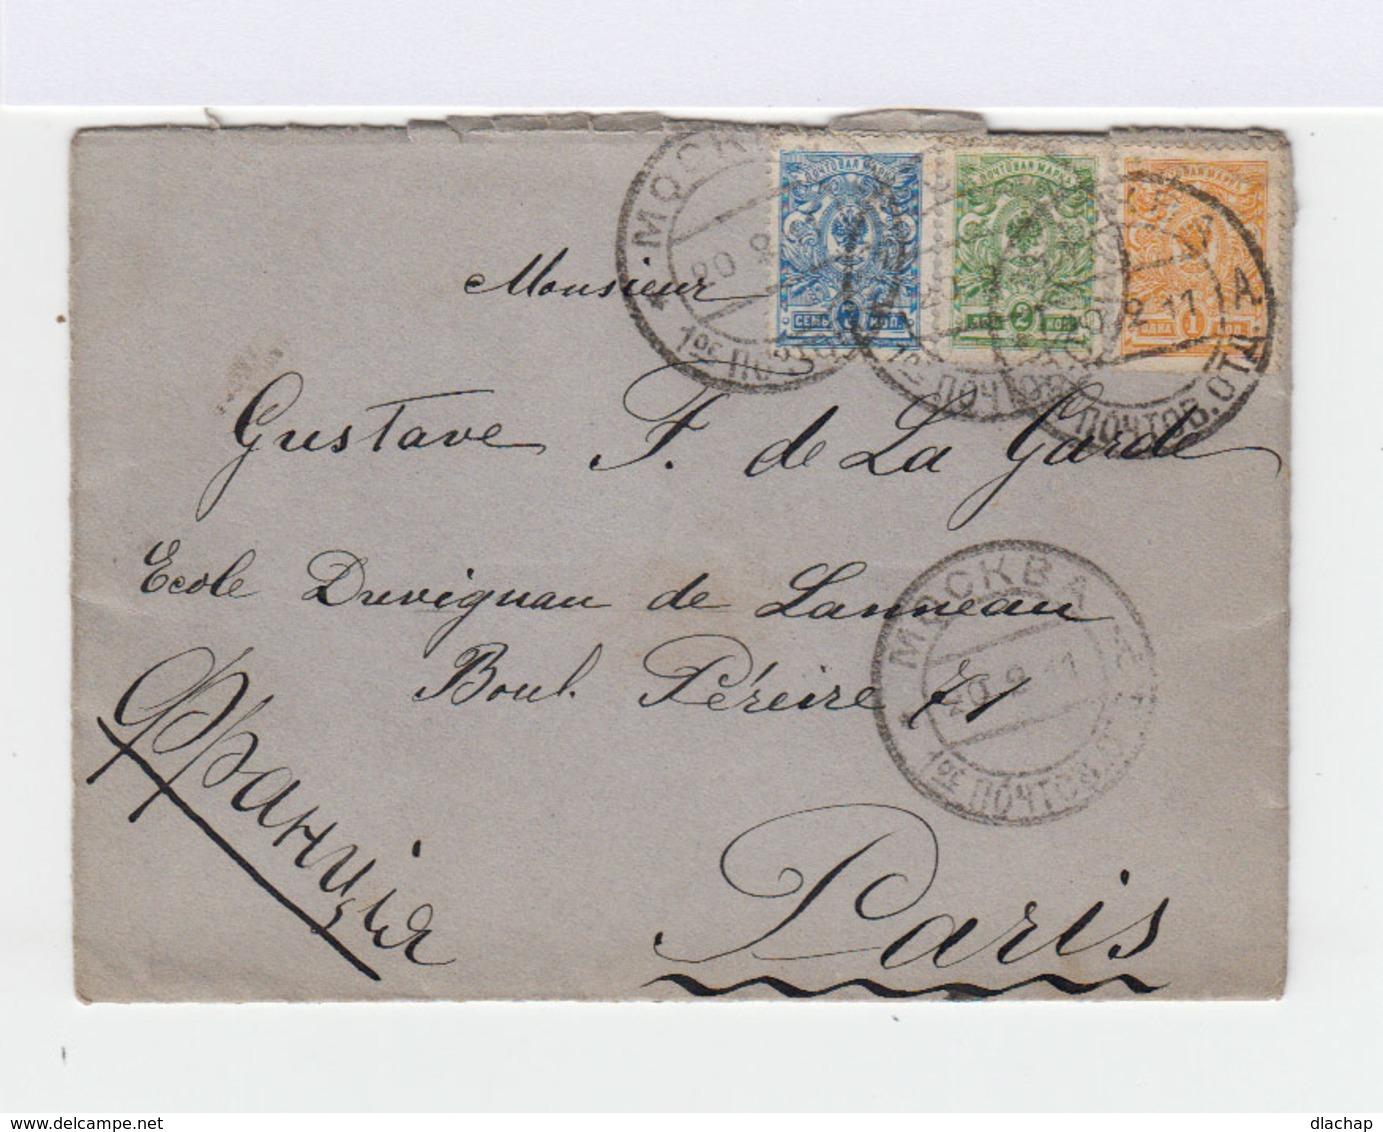 Sur Enveloppe Trois Timbres Empire Russe Armoiries 7k. Bleu, 1k. Orange, 2k. Vert. CAD Mockba 1911. (703) - 1857-1916 Empire